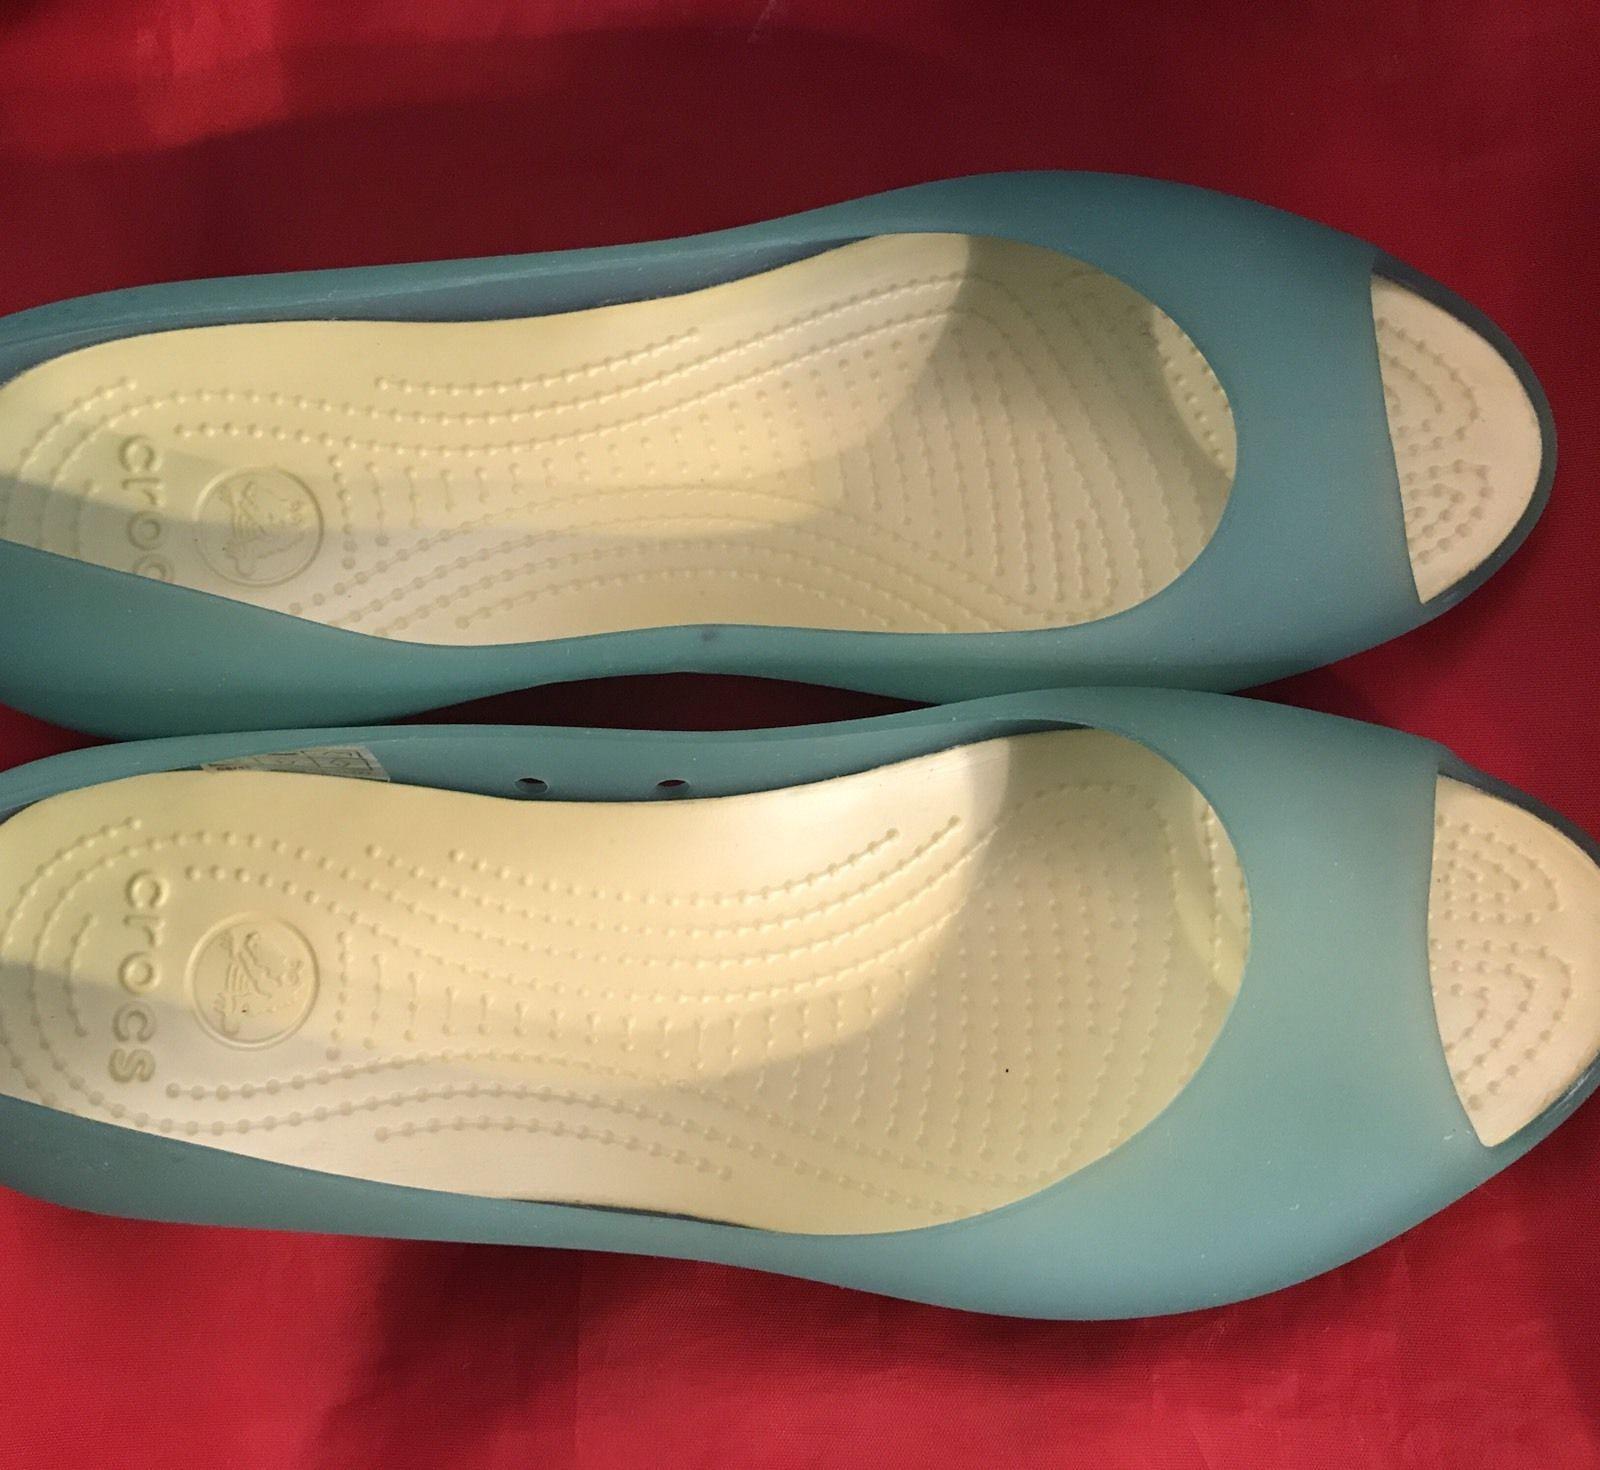 51dbcfb67ecb1c Crocs Carlie Lemon-Lime Green Peep Toe Ballet Flats Women s Size 11